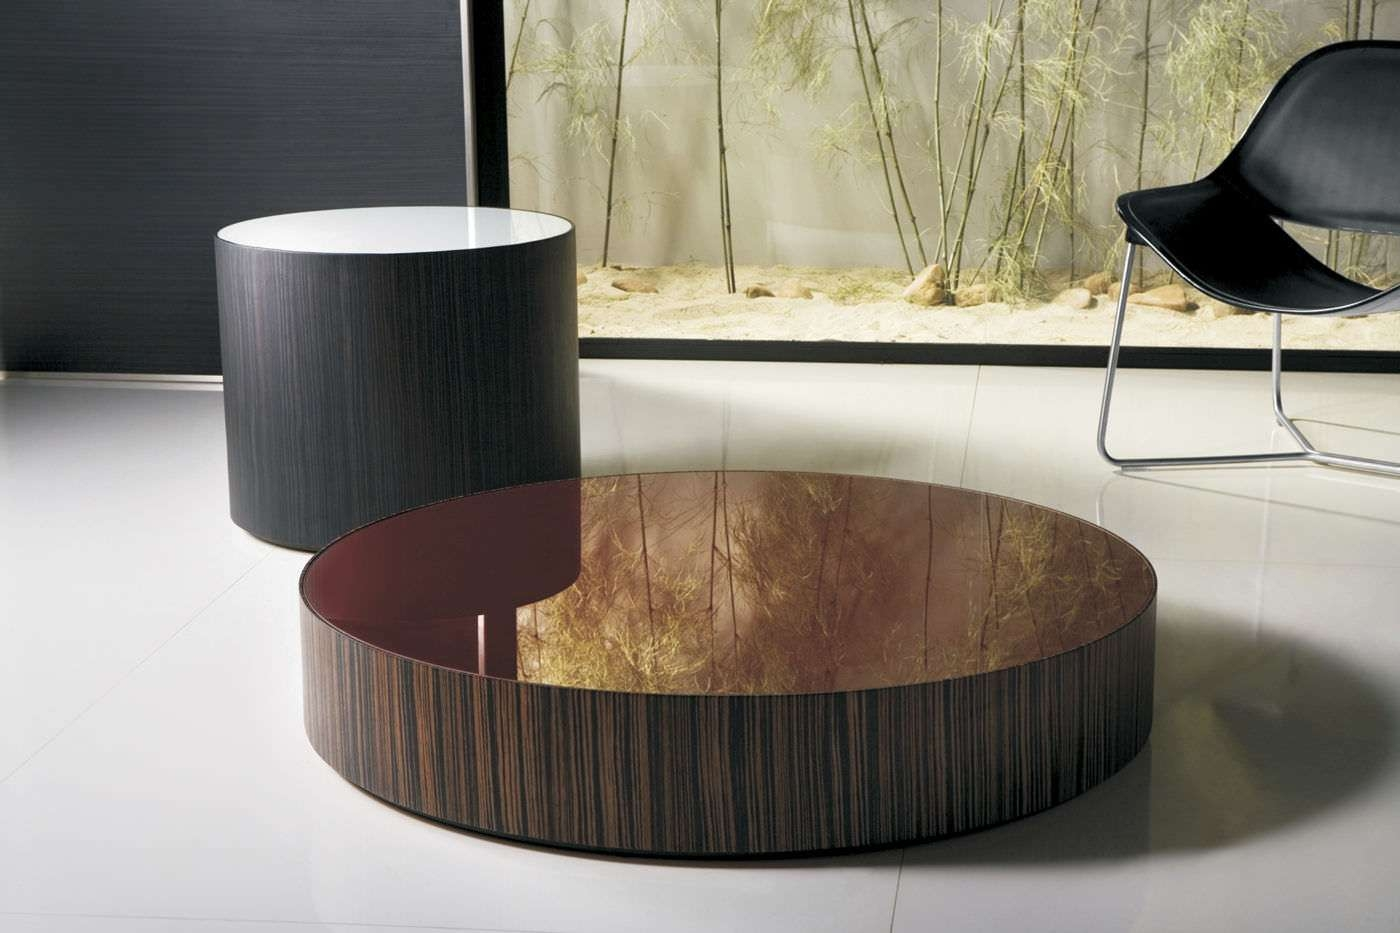 Most Recently Released Contemporary Coffee Table Regarding Elegant Decor Contemporary Coffee Table — Novalinea Bagni Interior (View 16 of 20)